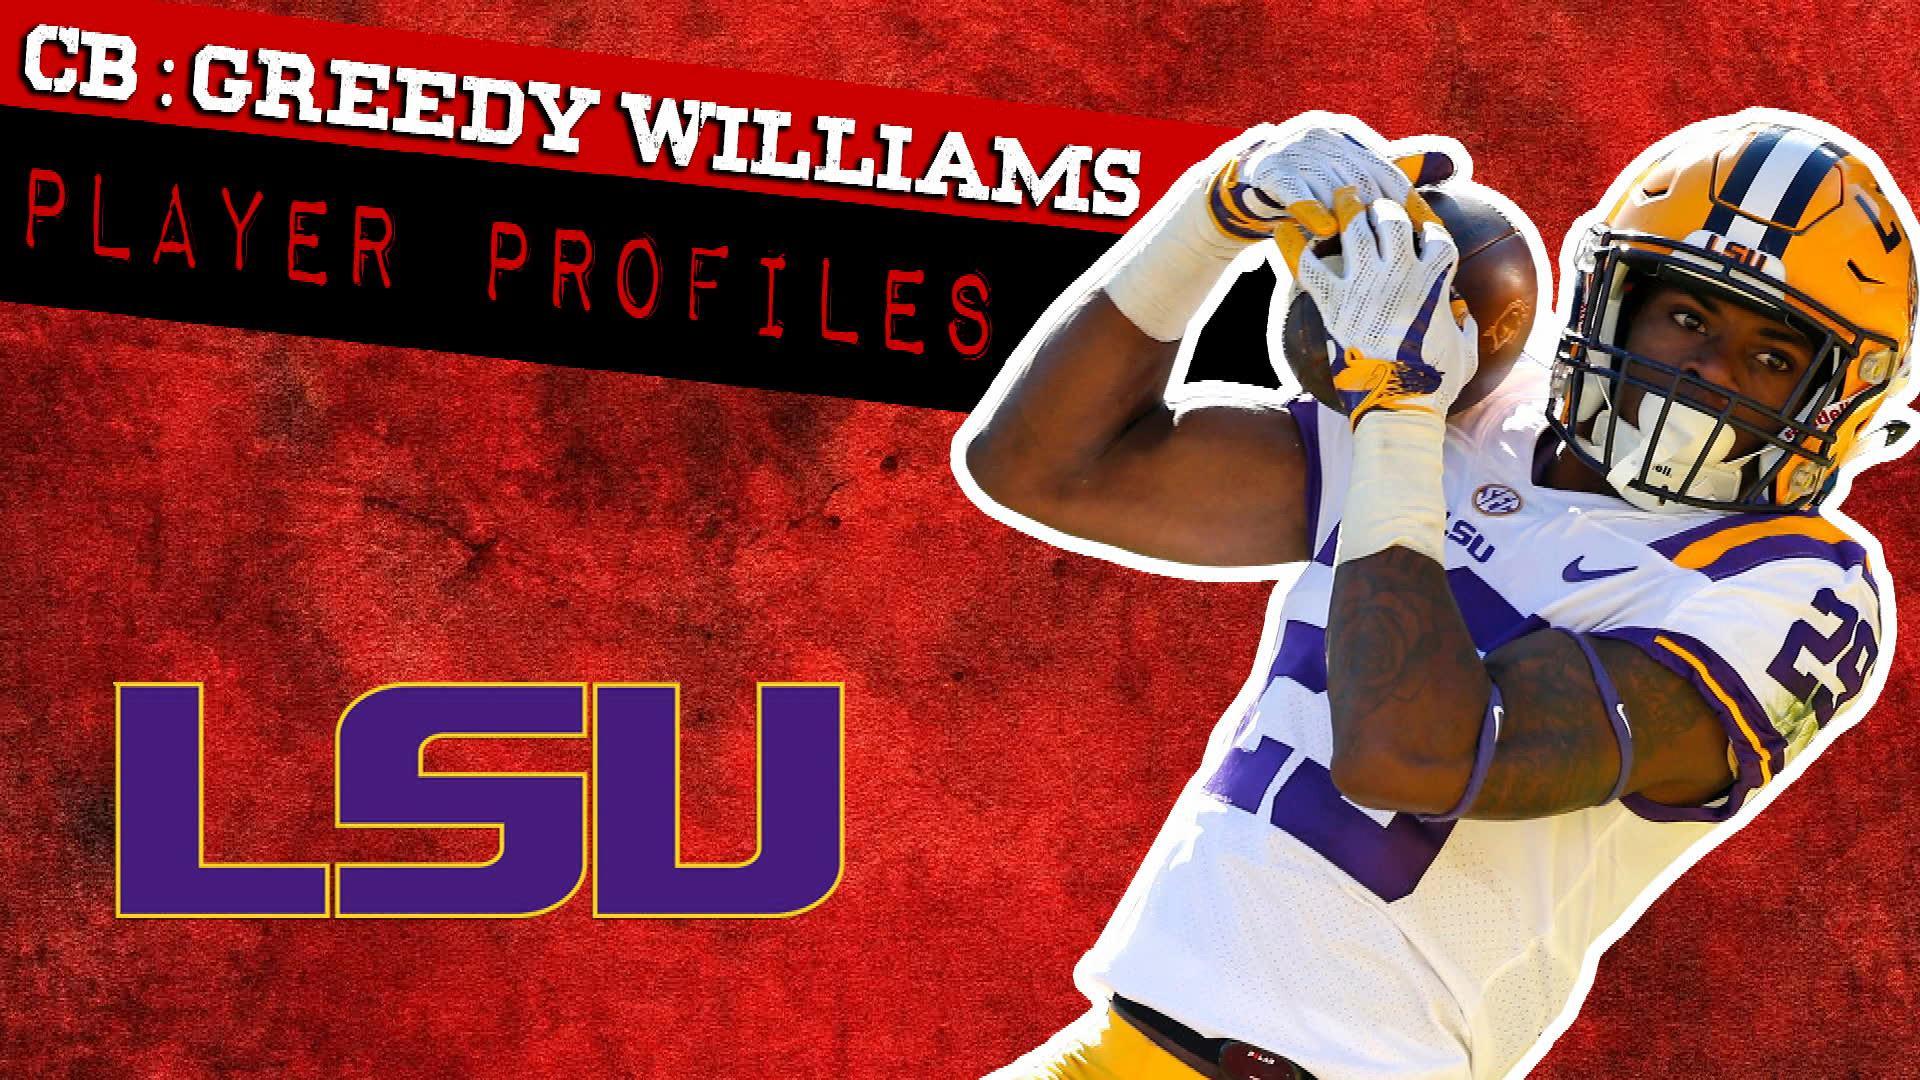 2019 NFL Draft profile: Greedy Williams, LSU